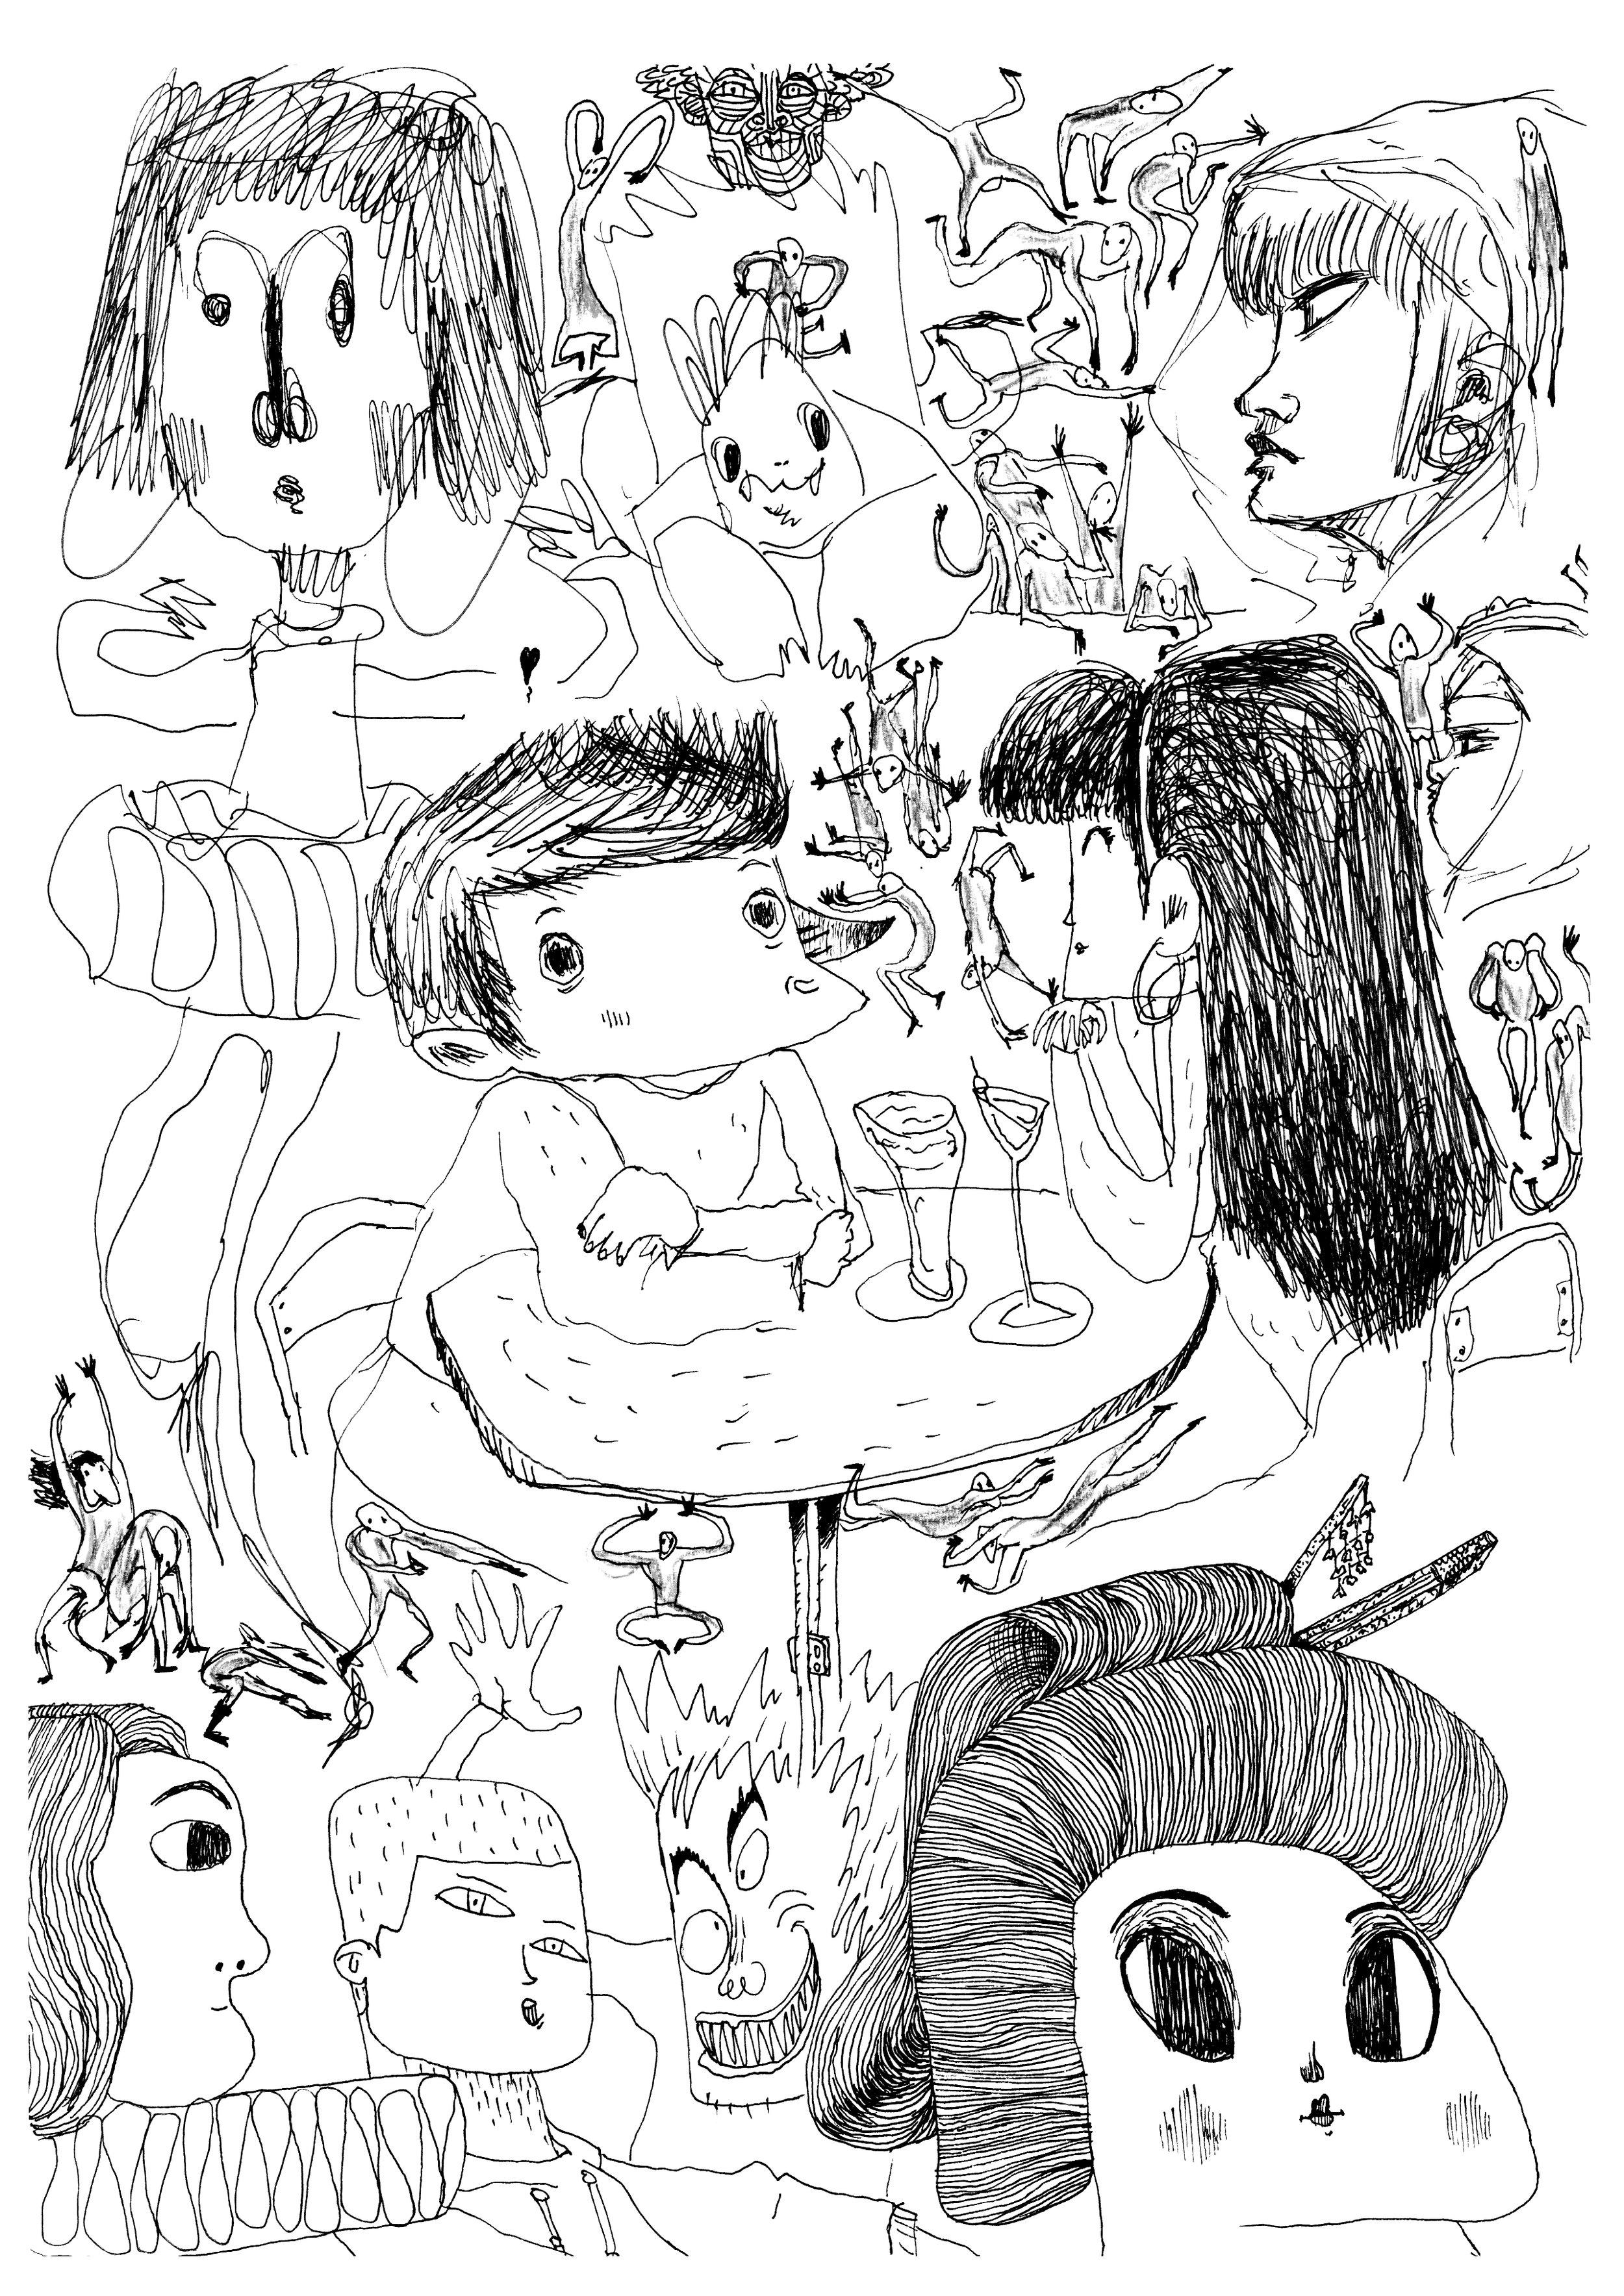 Pascal_Zaffiro_Doodle_17.jpg